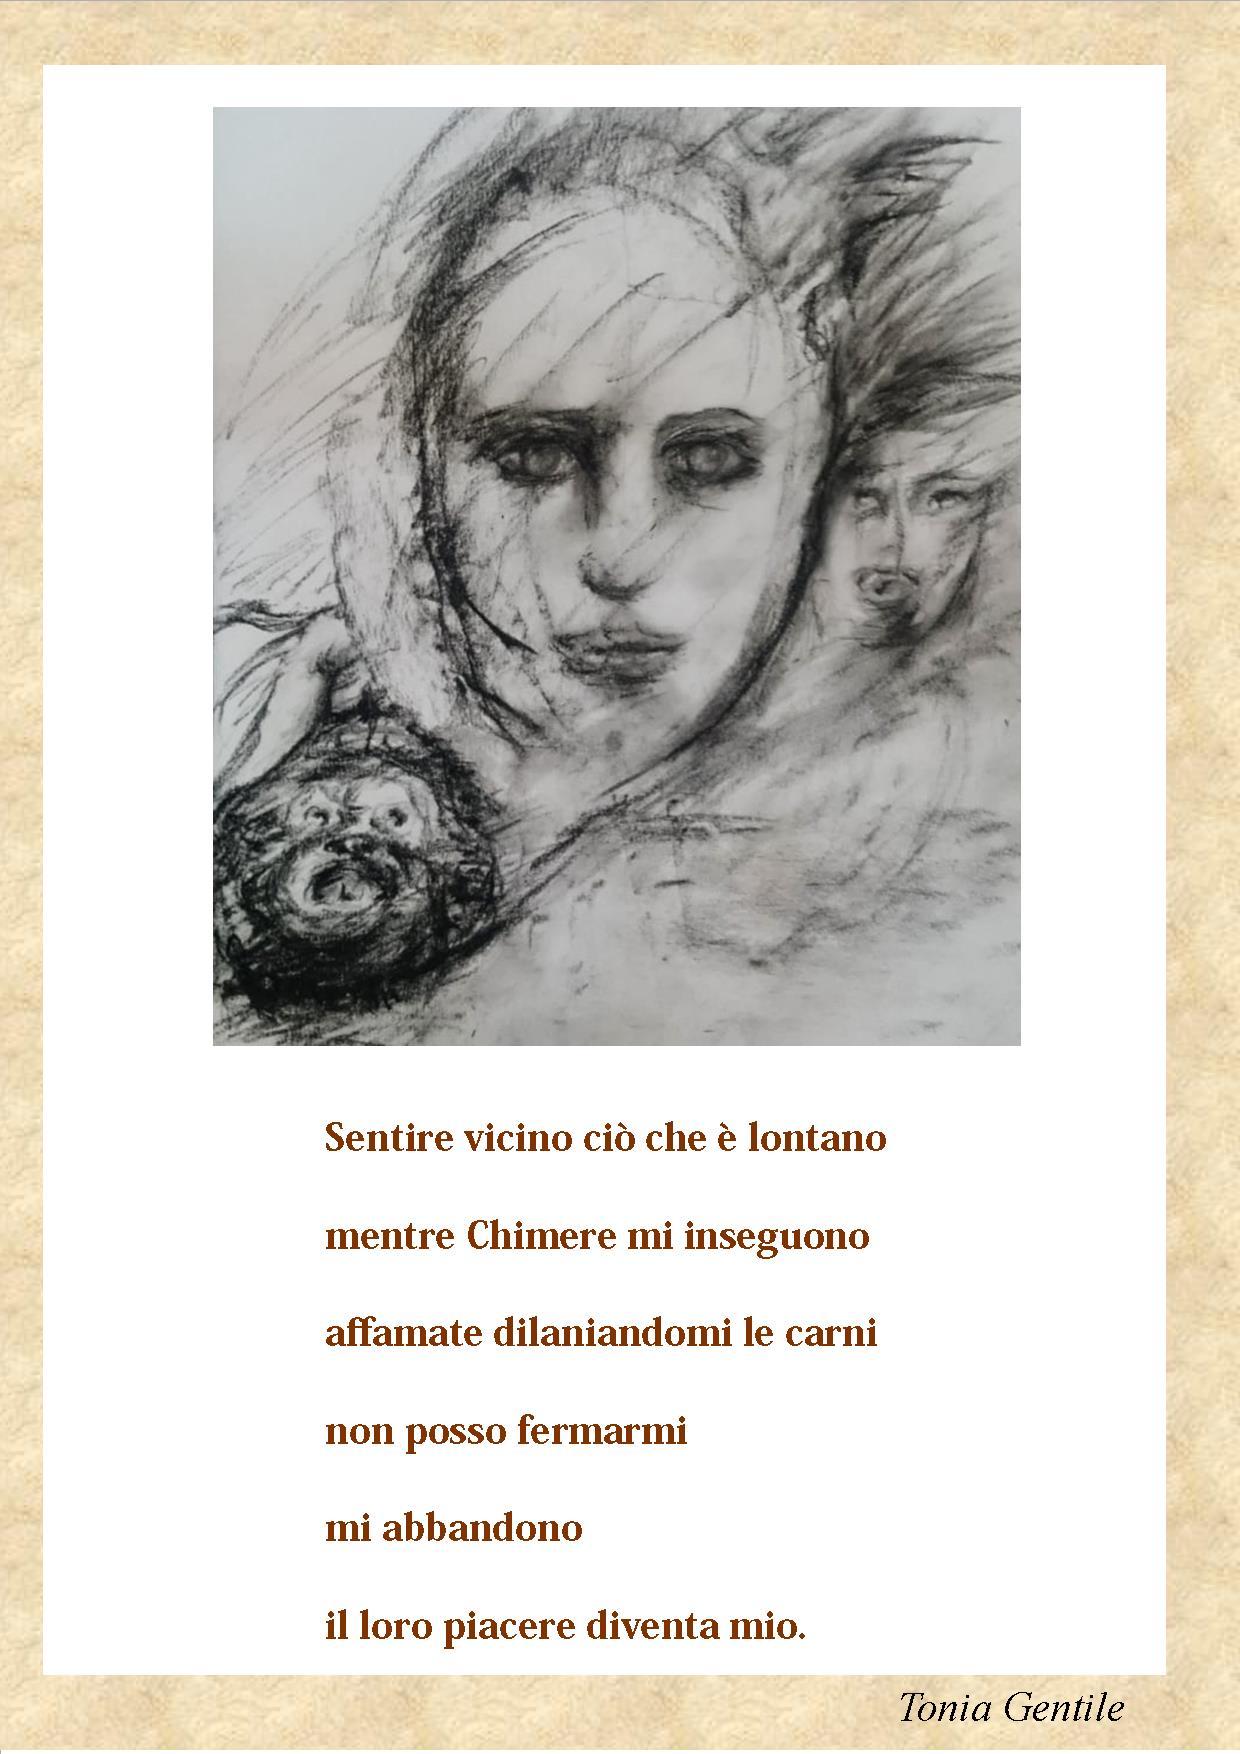 giurnata-della-poesia